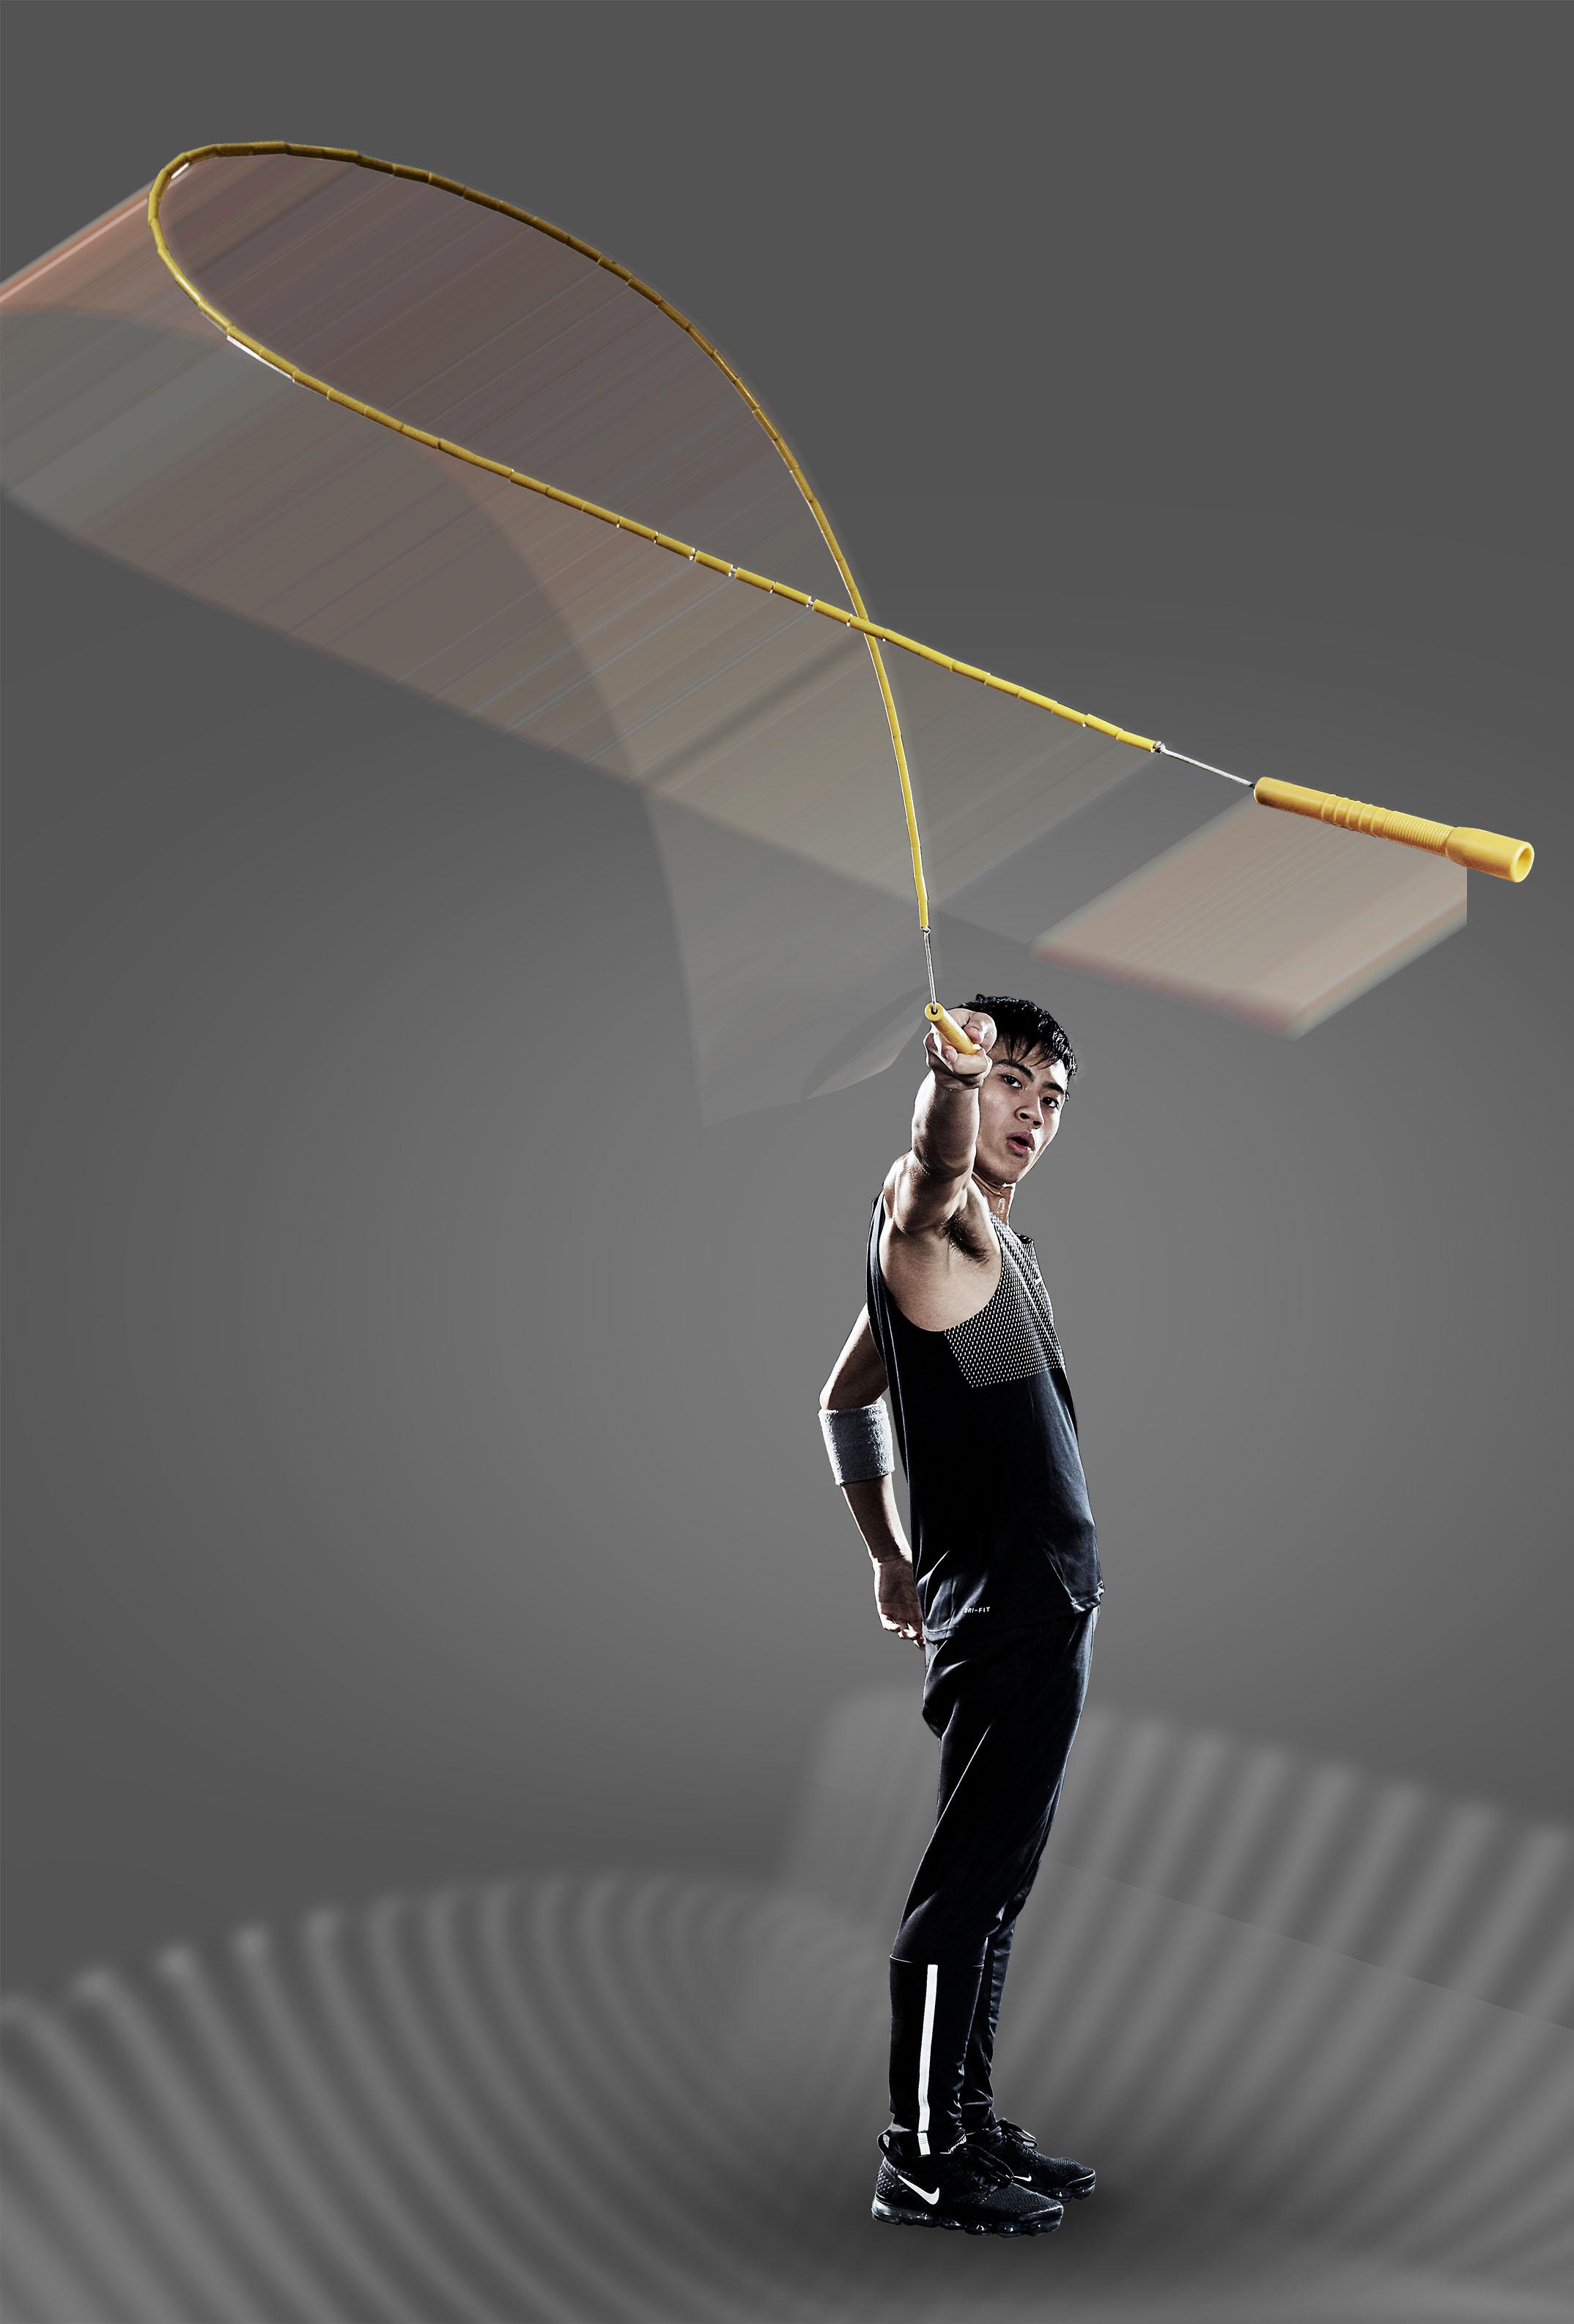 #hongkong #The_rope #athlete #workout #s